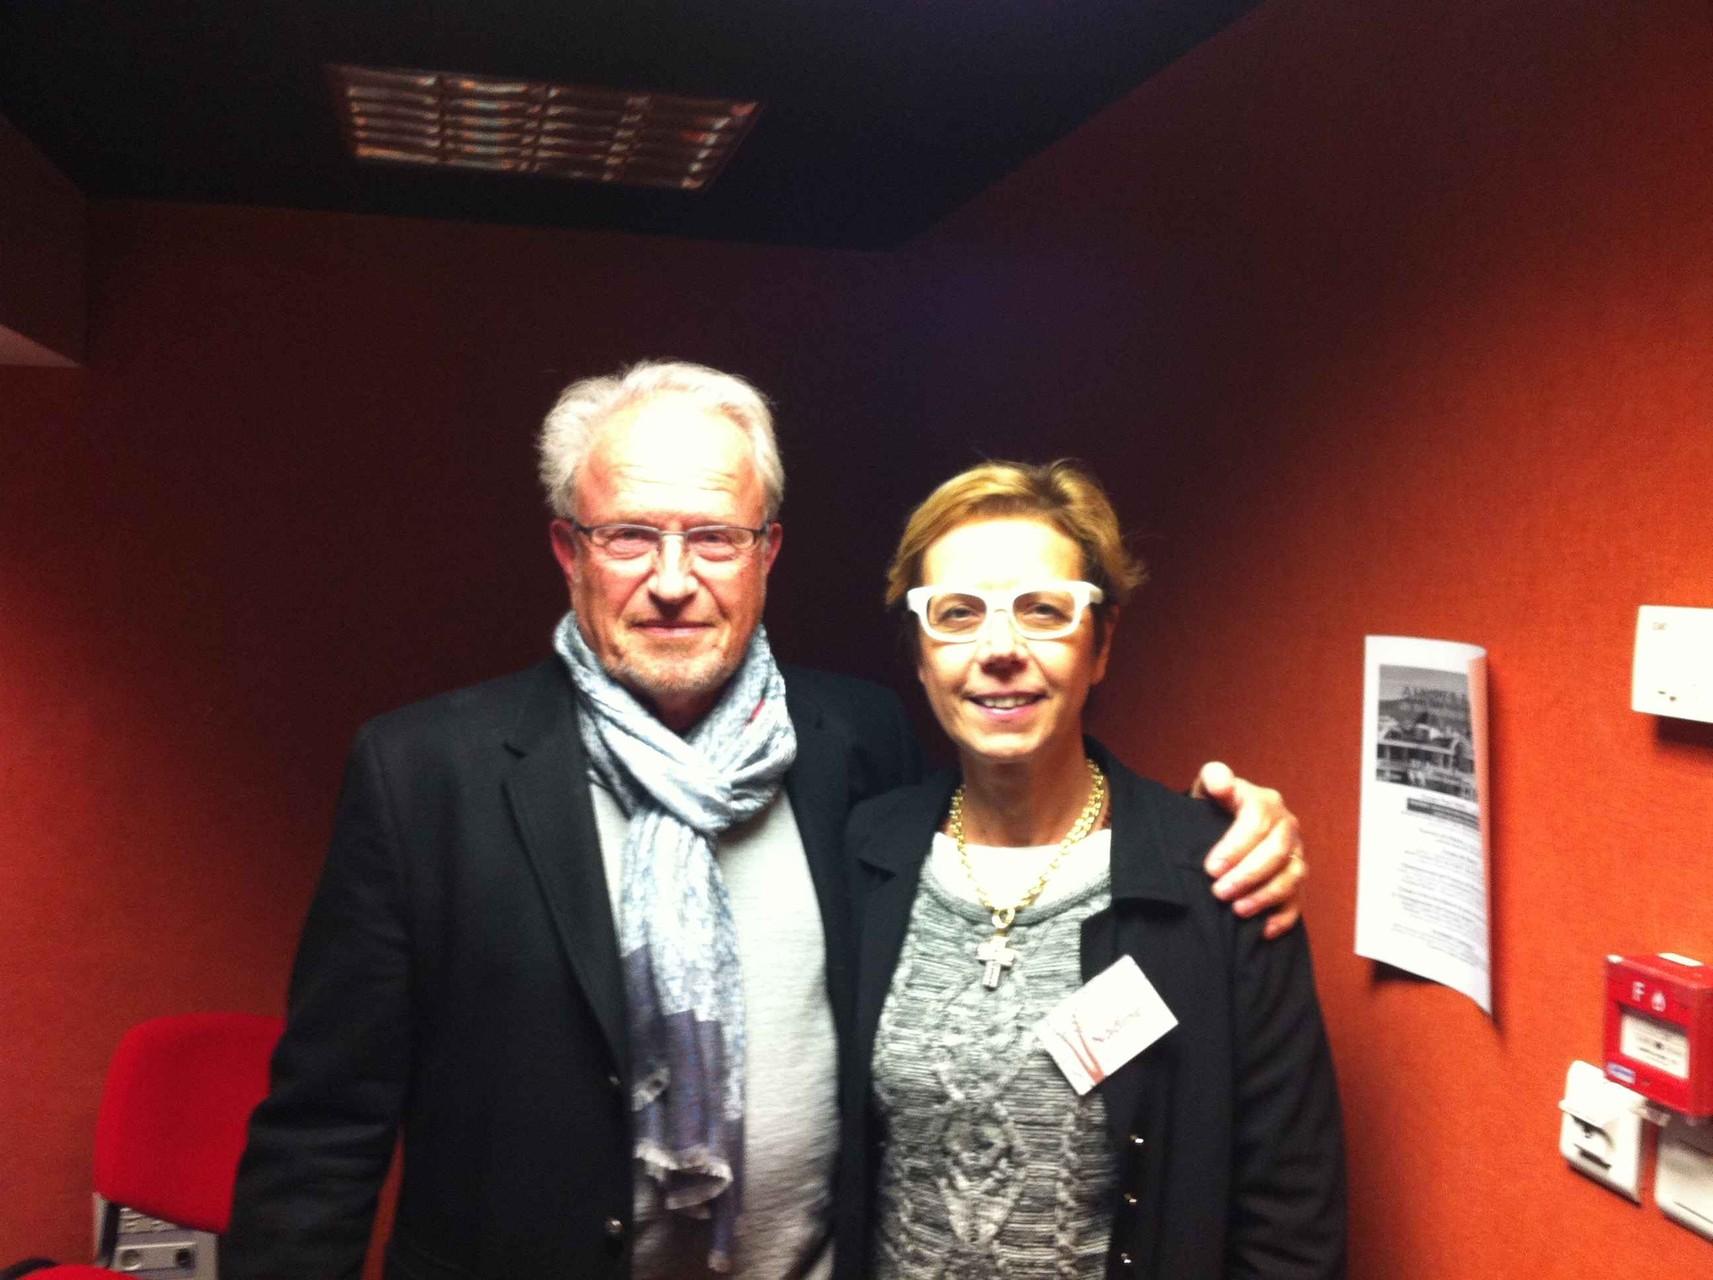 Shivani avec Andreas Freund